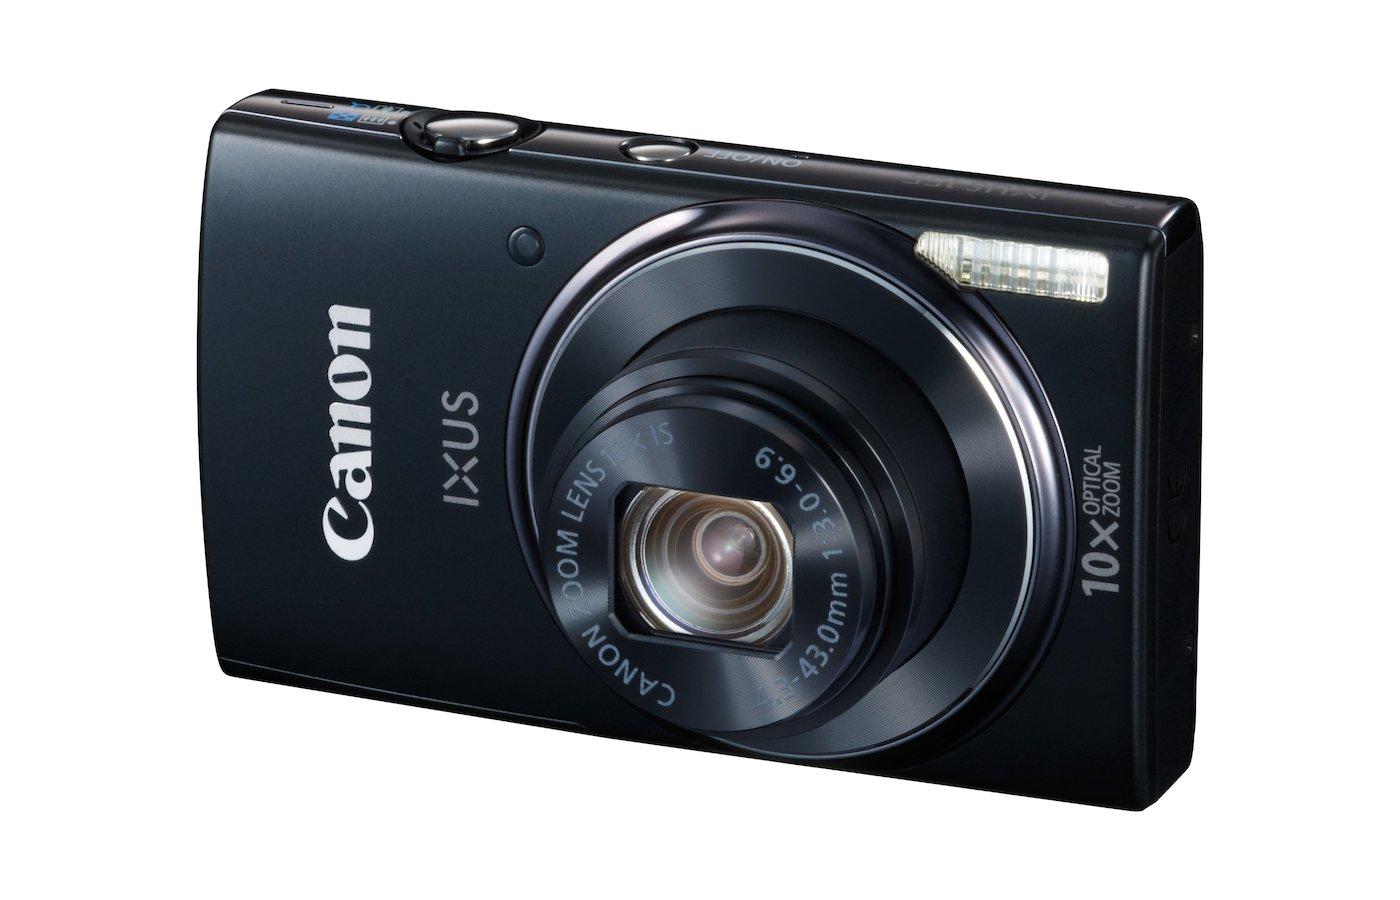 Фотоаппарат компактный CANON IXUS 155 black